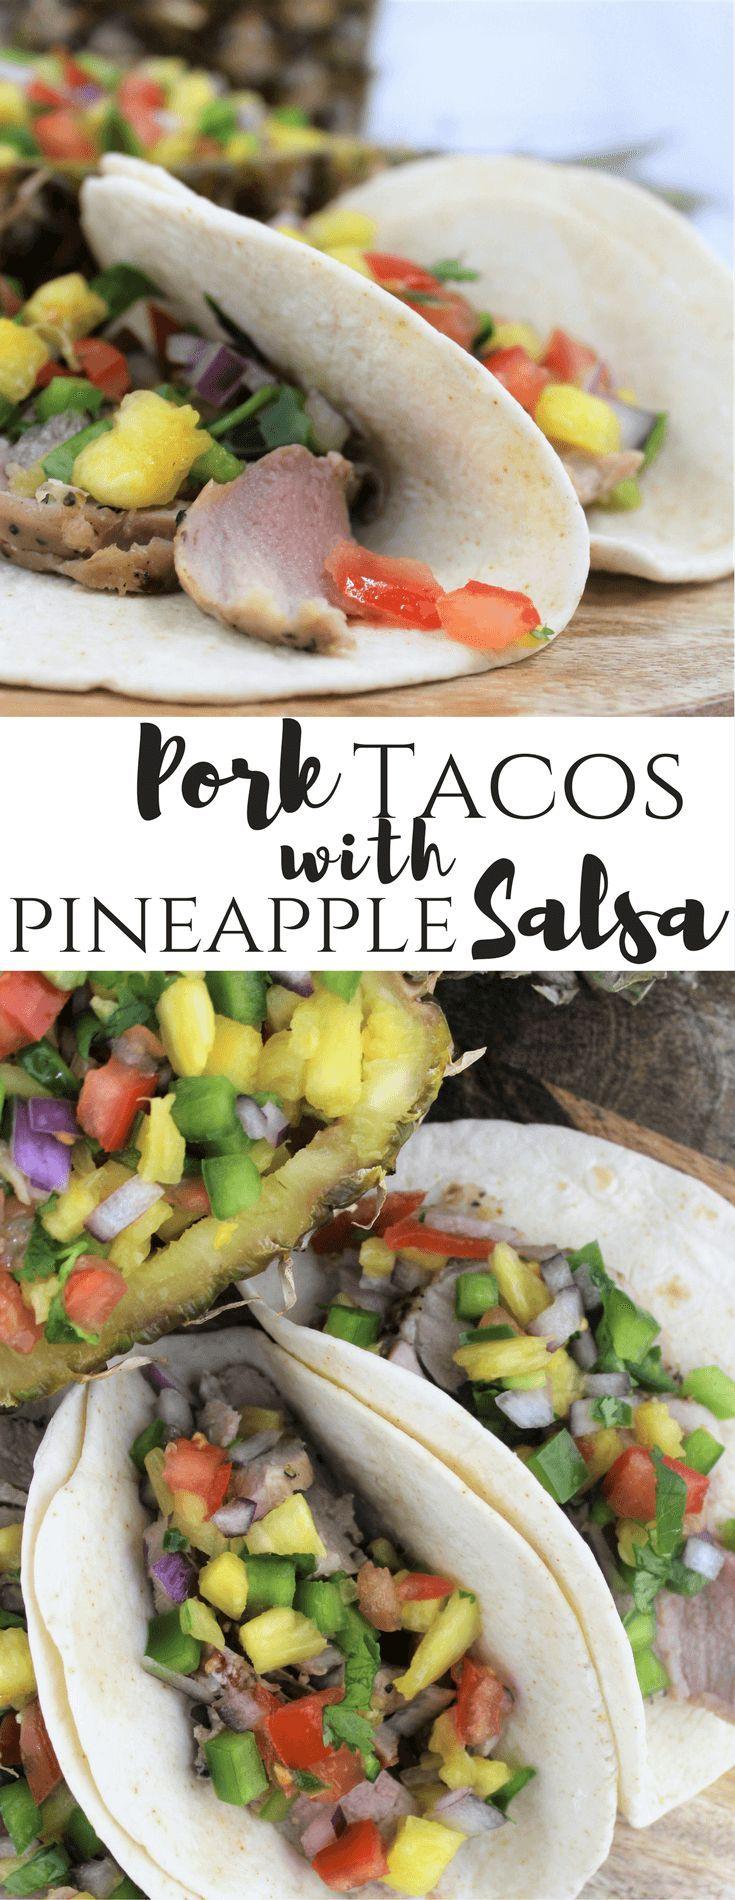 RealFlavorRealFast Pork, #ad, Tacos with Pineapple Salsa